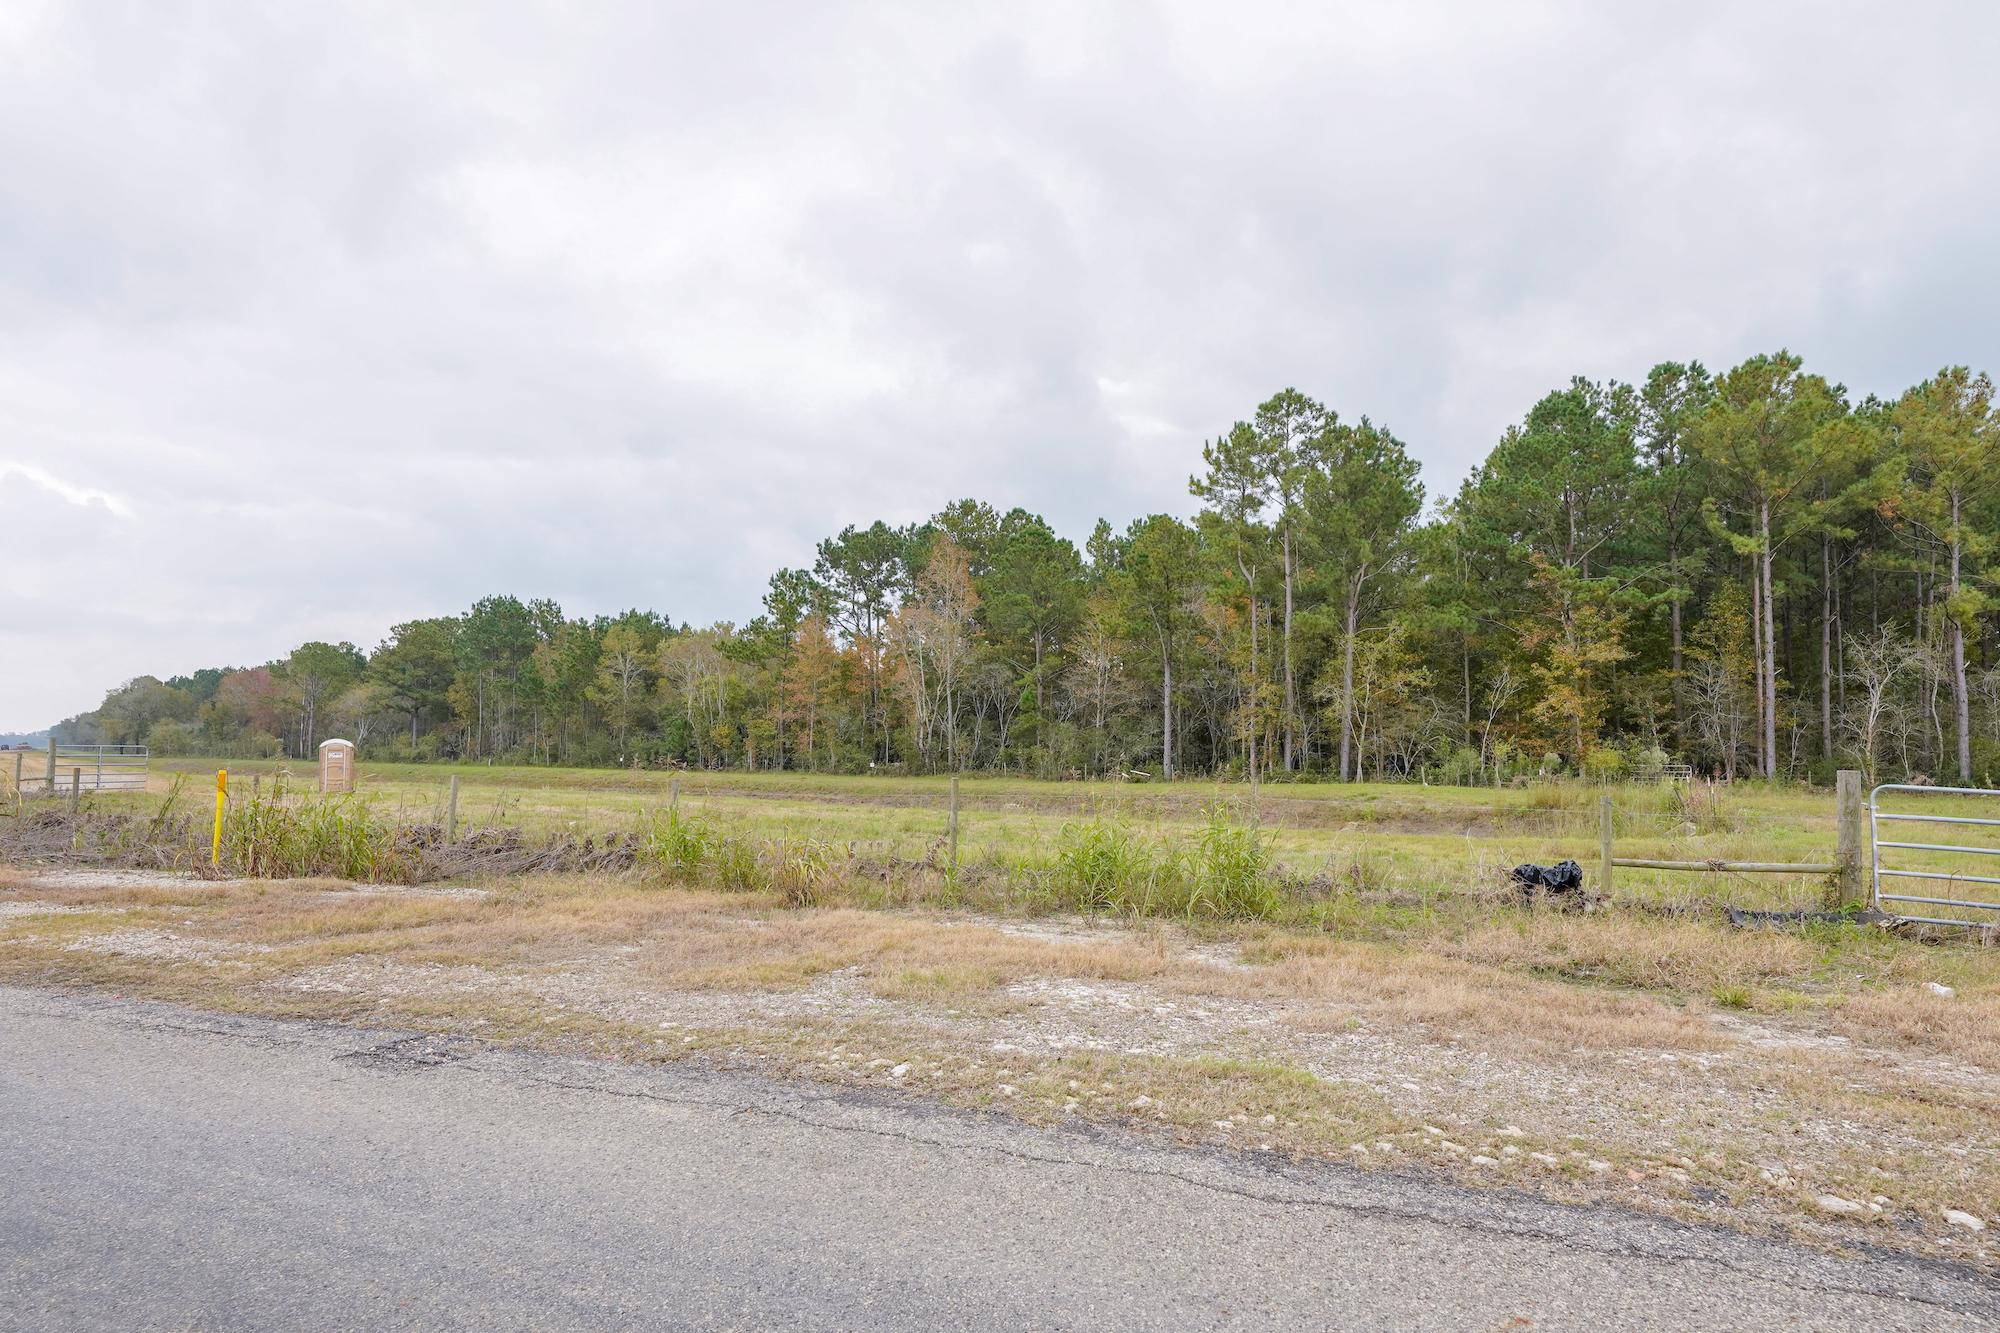 Jefferson County Development Land - Image 8 of 36